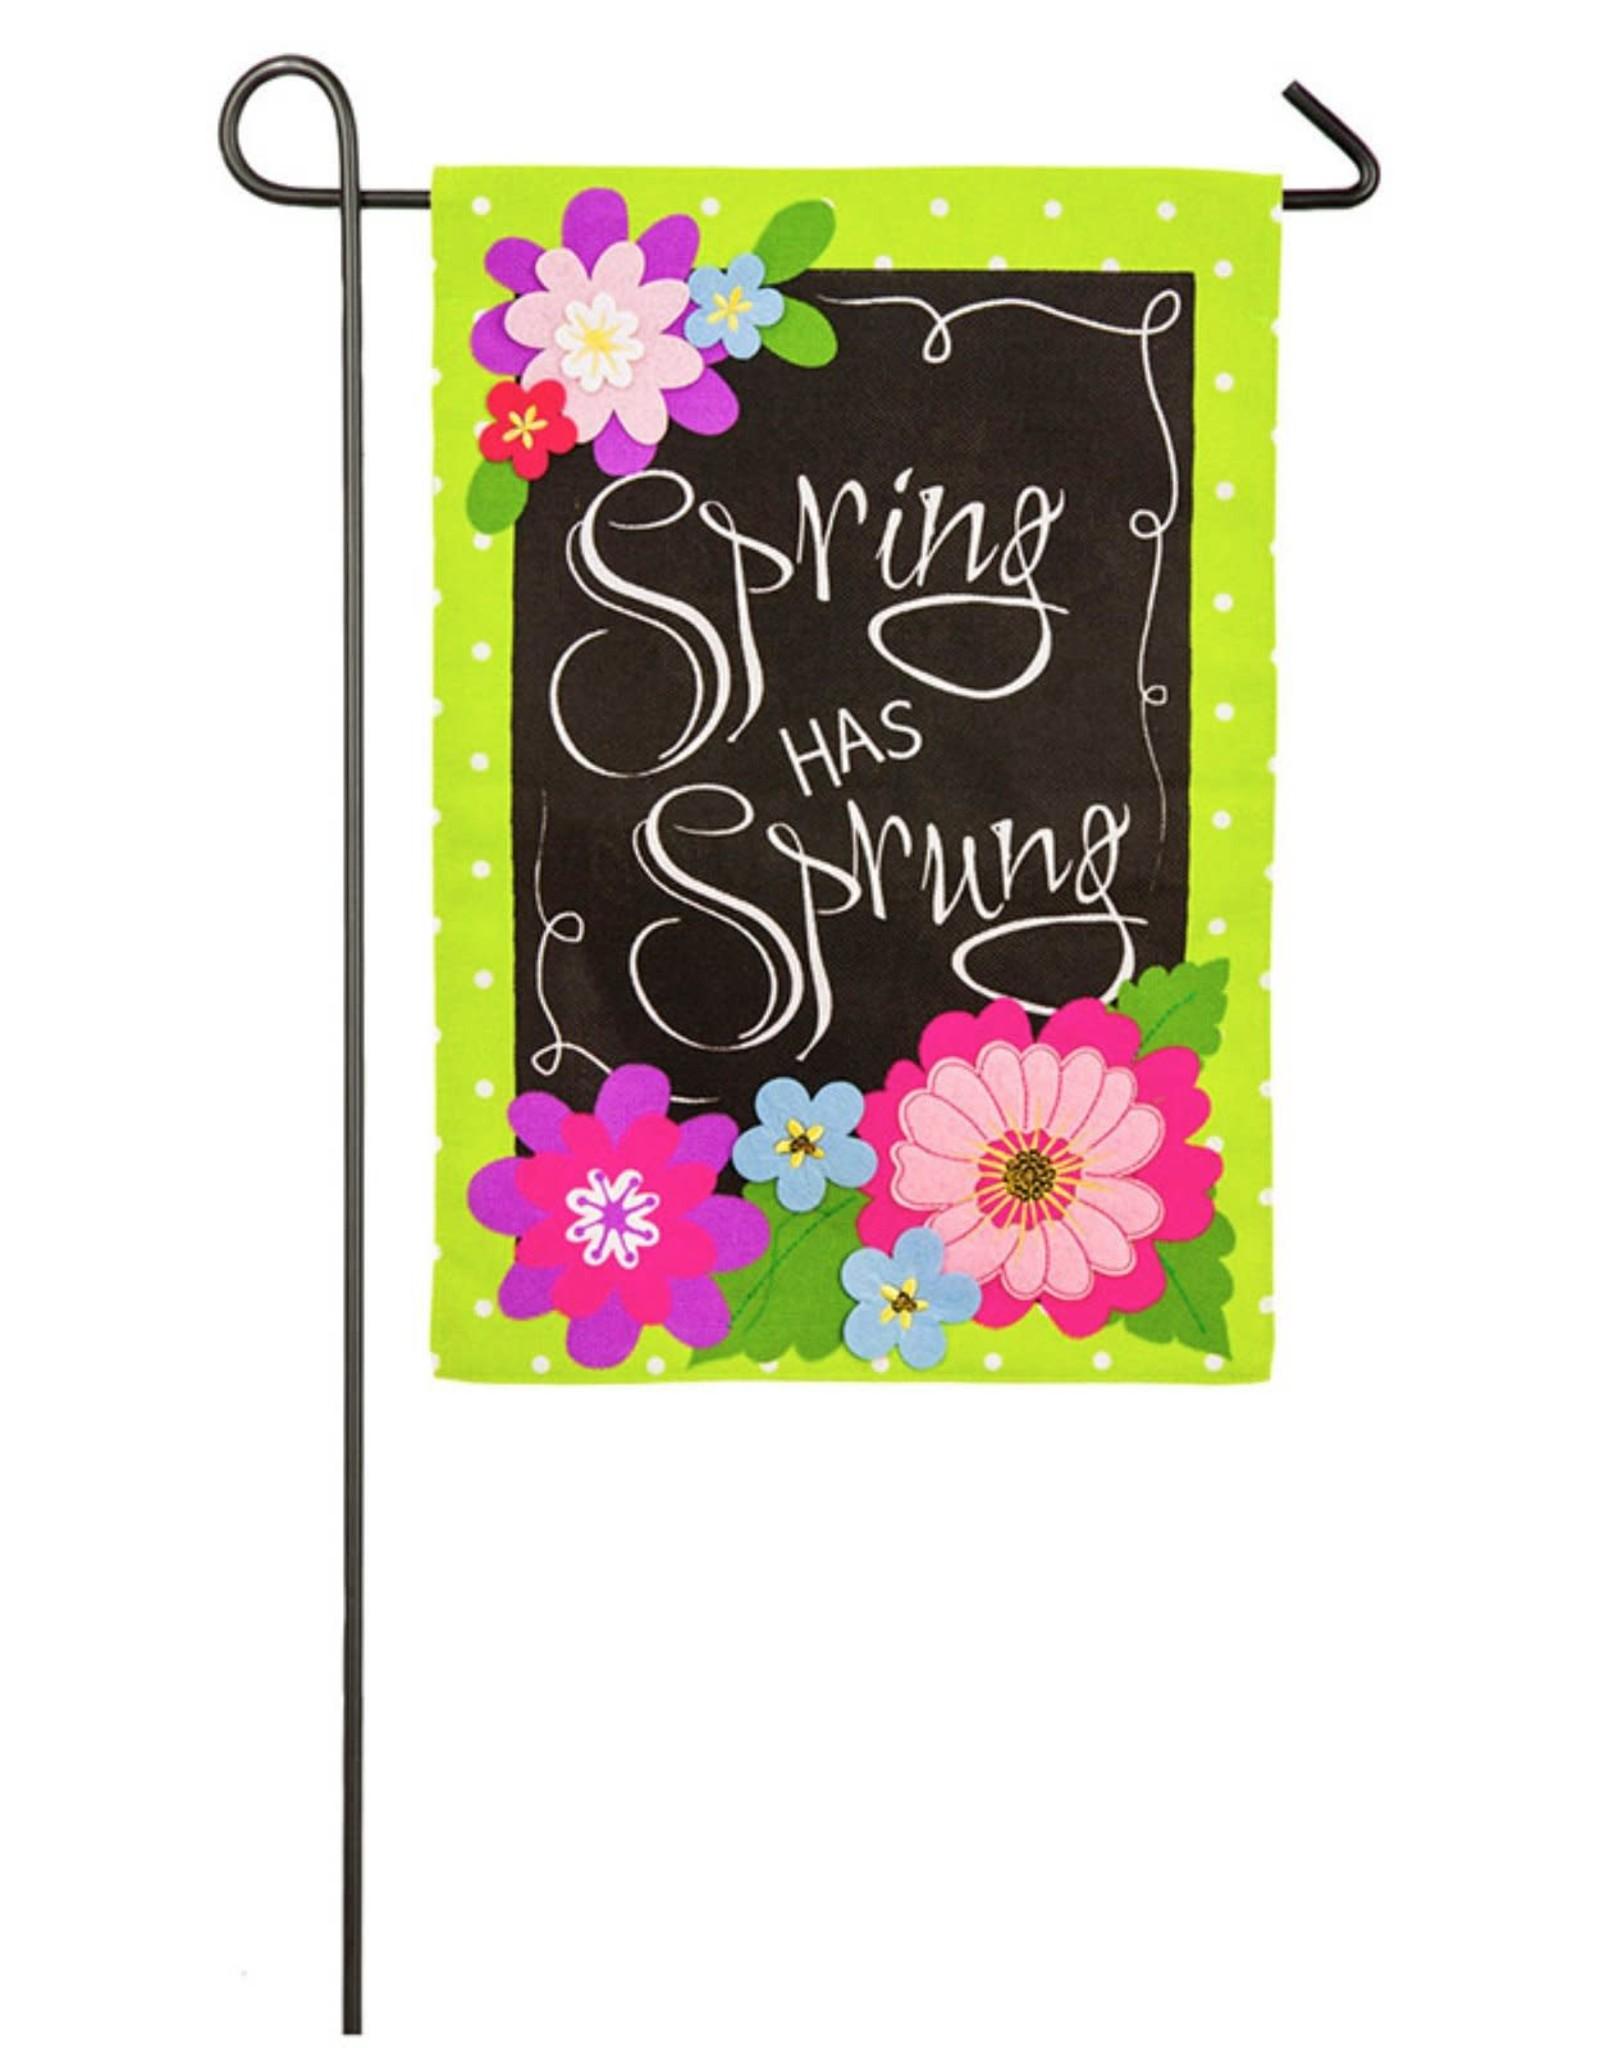 Evergreen EV GF Spring Has Sprung